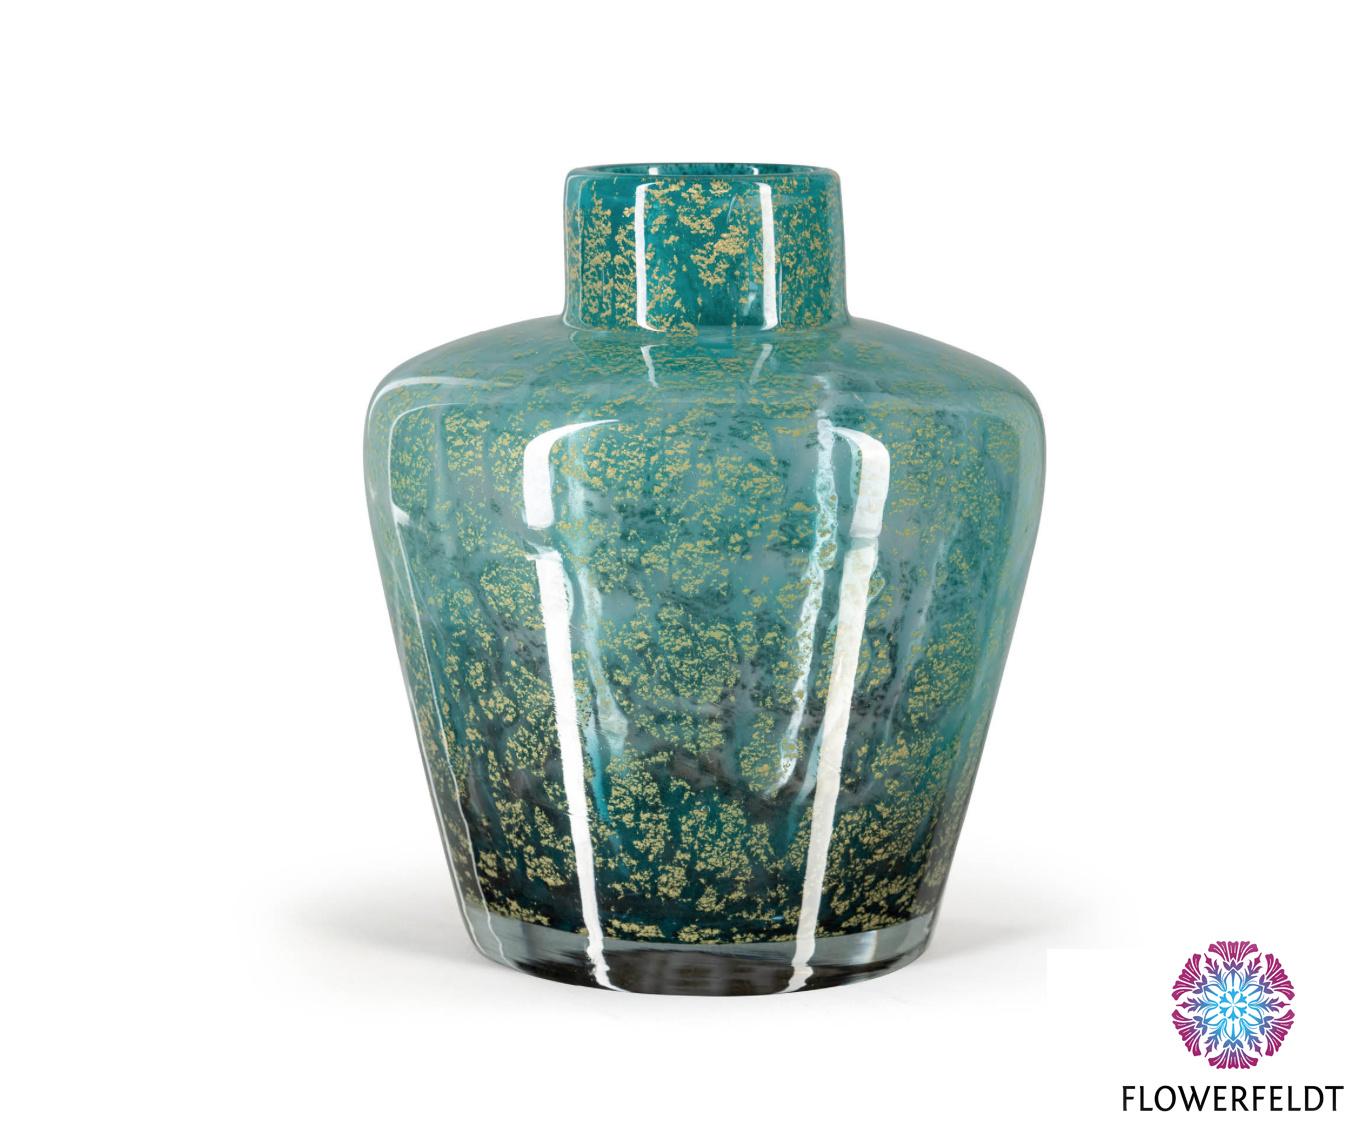 Fidrio Vases green icon Fiji - H25 cm